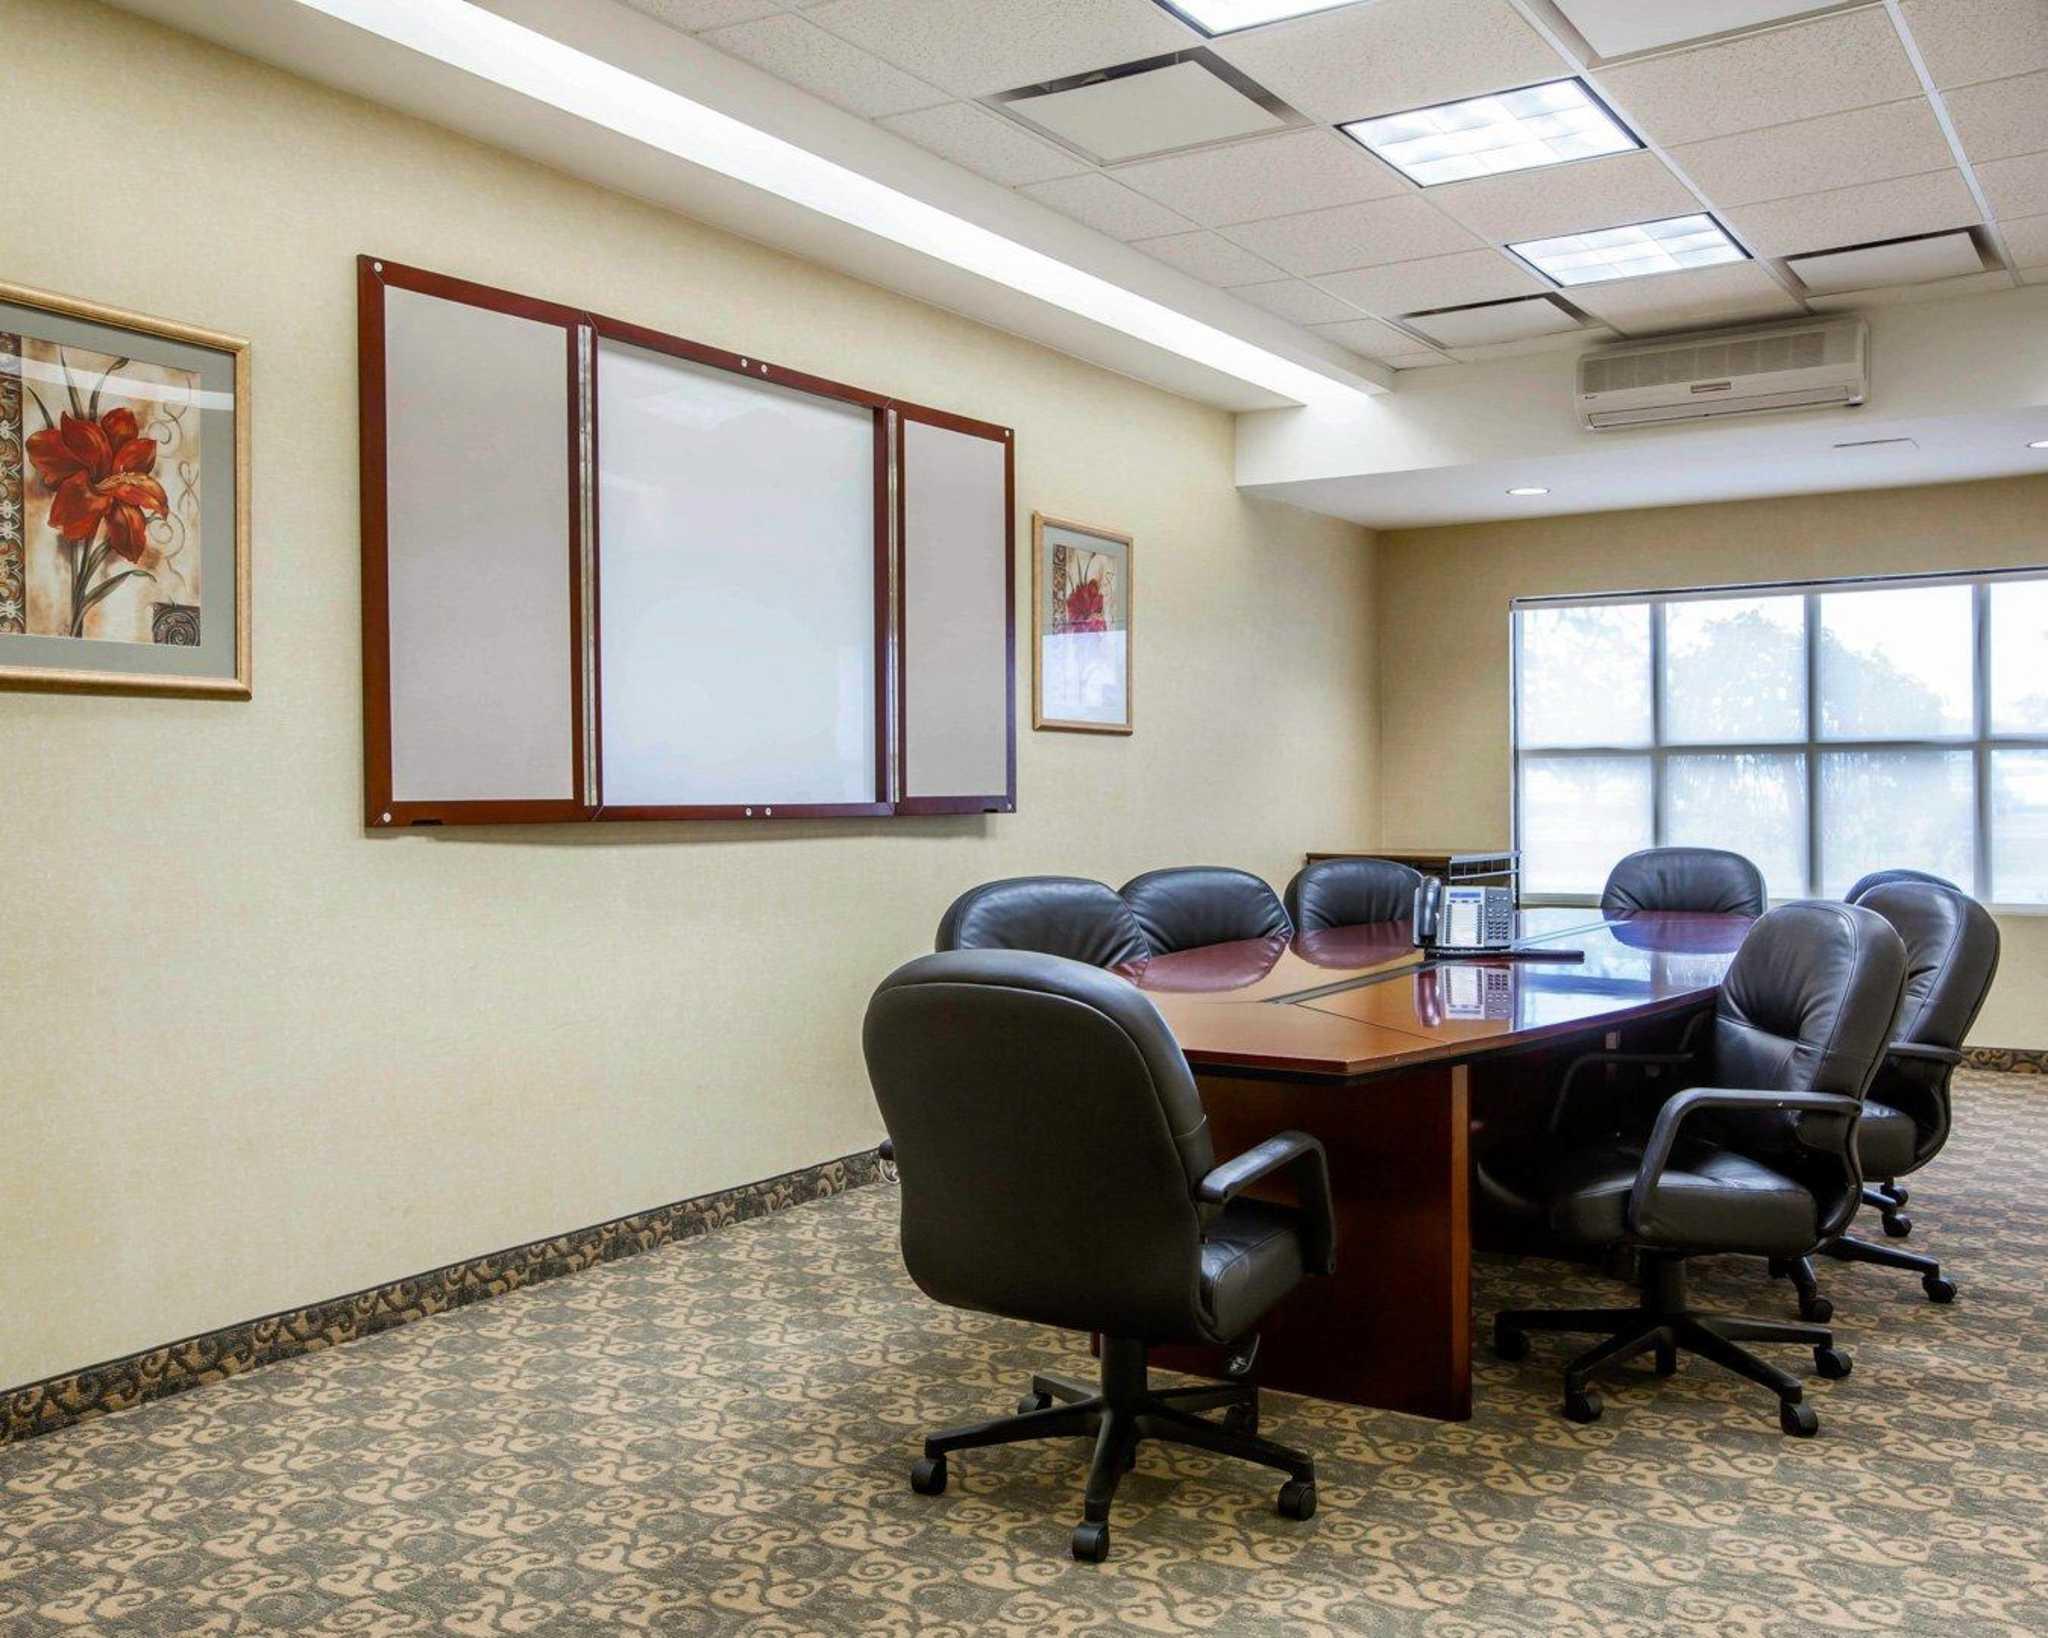 Comfort Inn & Suites adj to Akwesasne Mohawk Casino image 34